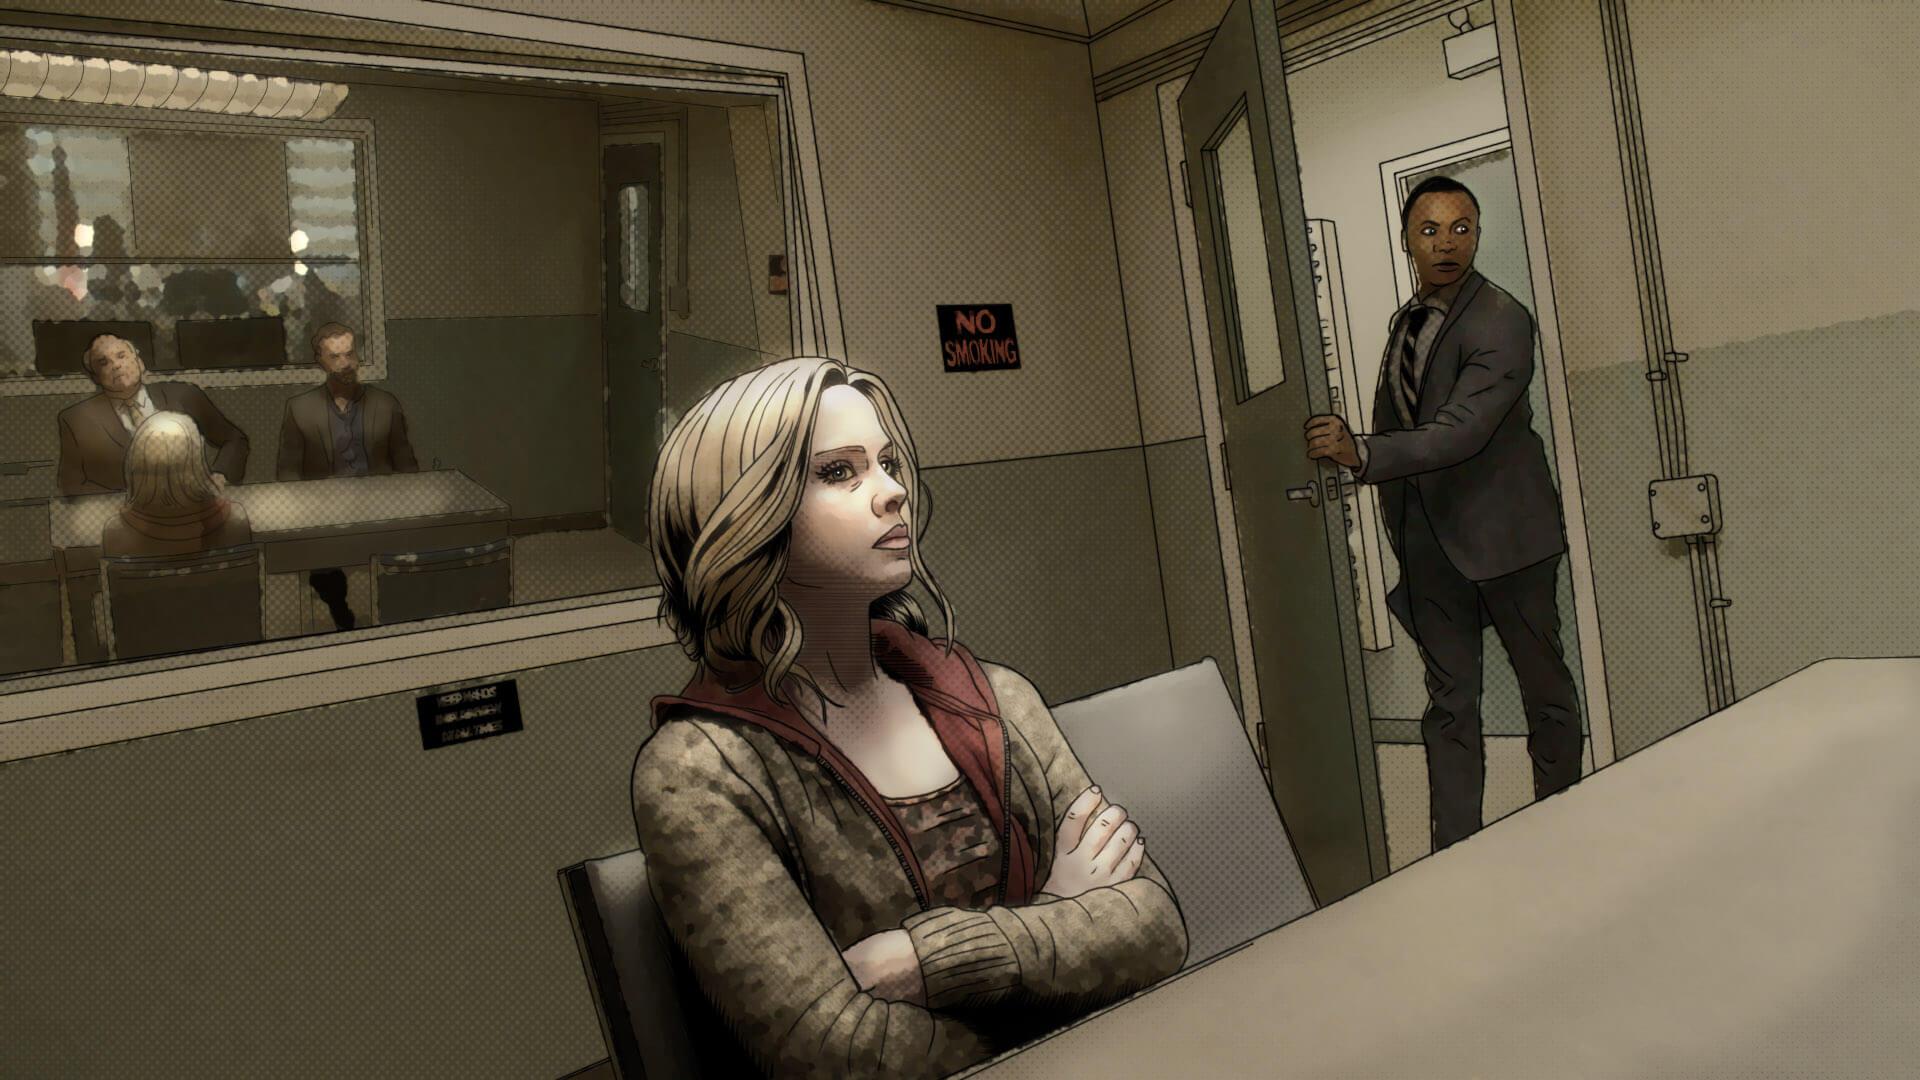 EP3_030_Interrogation_RD